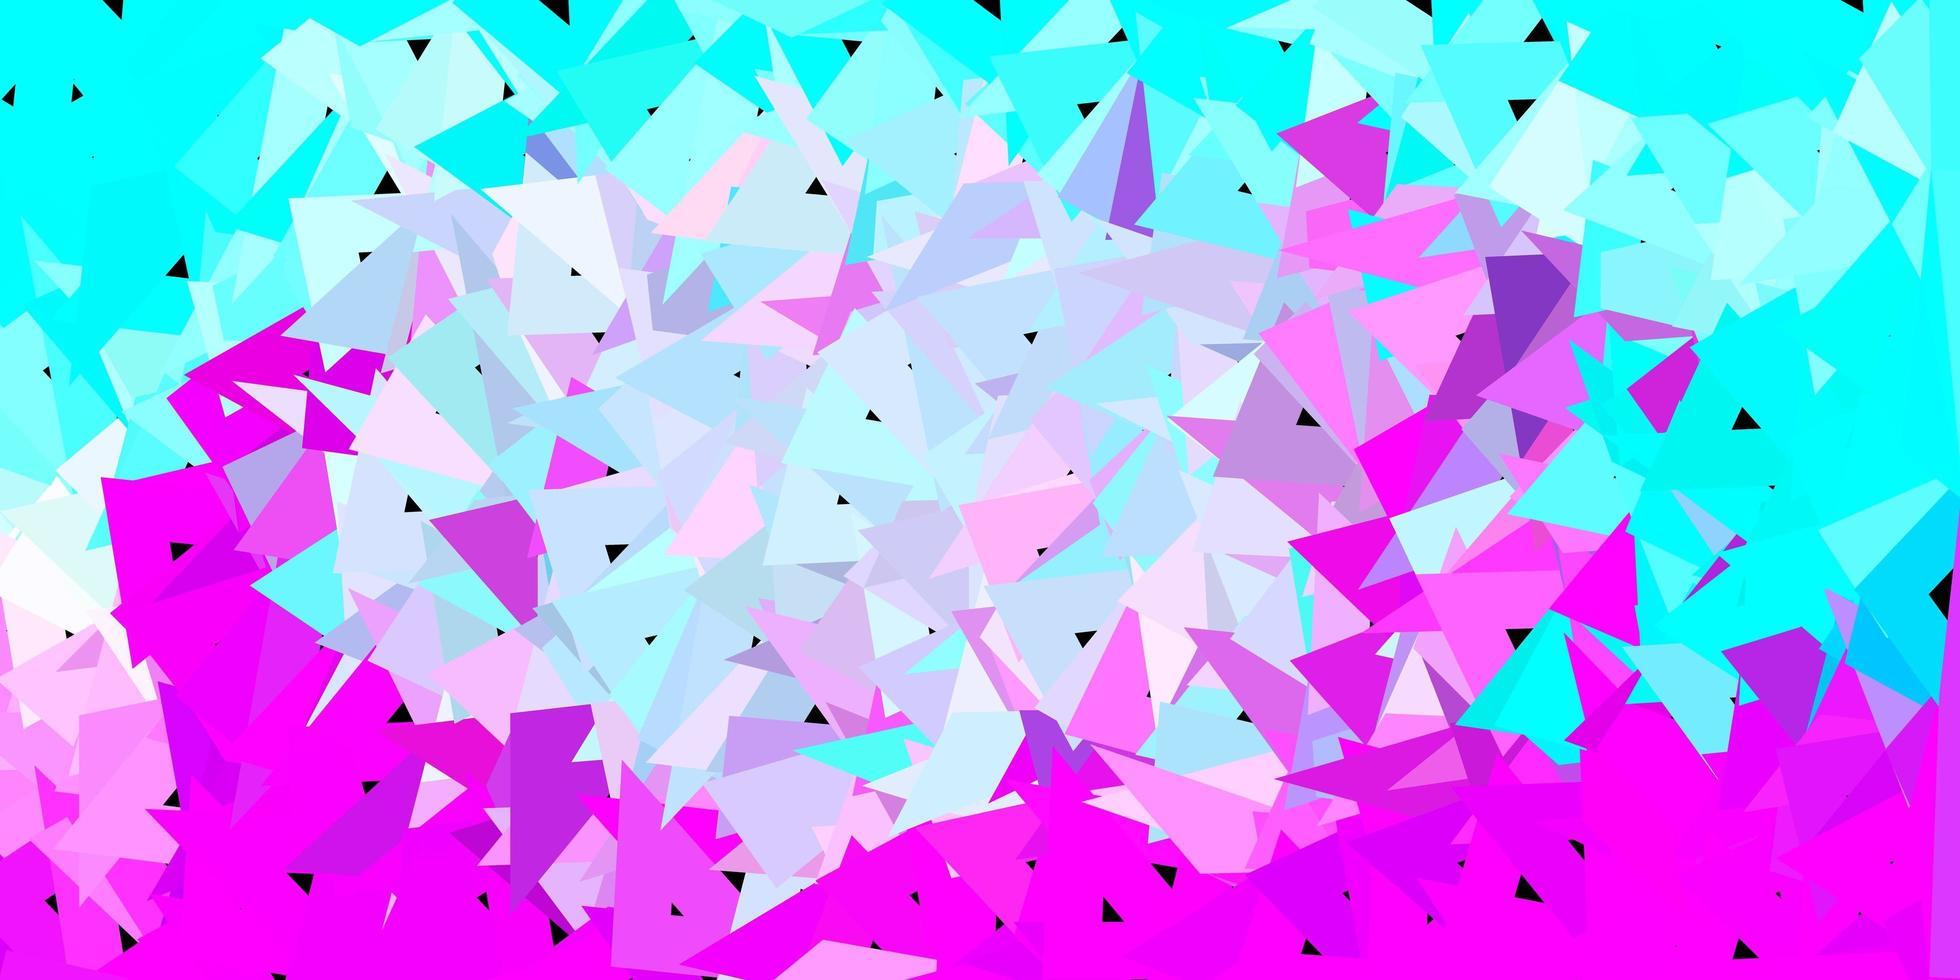 Disposition de triangle poly vecteur rose clair, bleu.